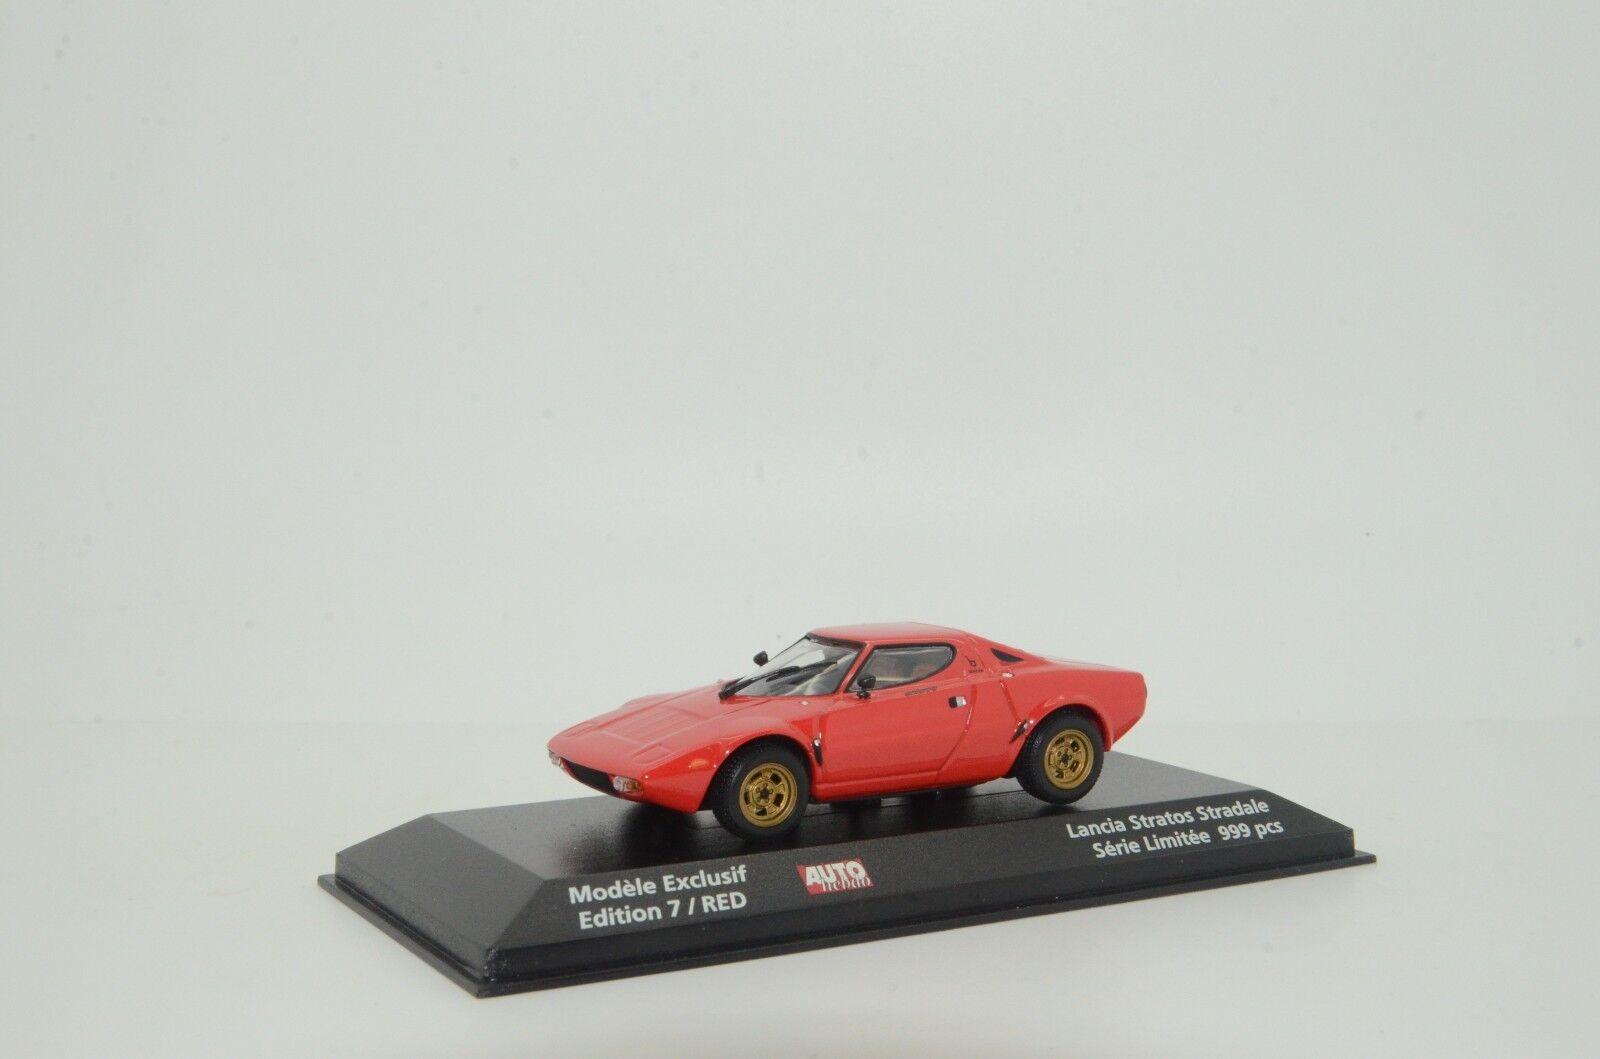 Rare Lancia Stratos modellllerlere Exklusef bilHEBDO röd Minichamps 125024 1  43